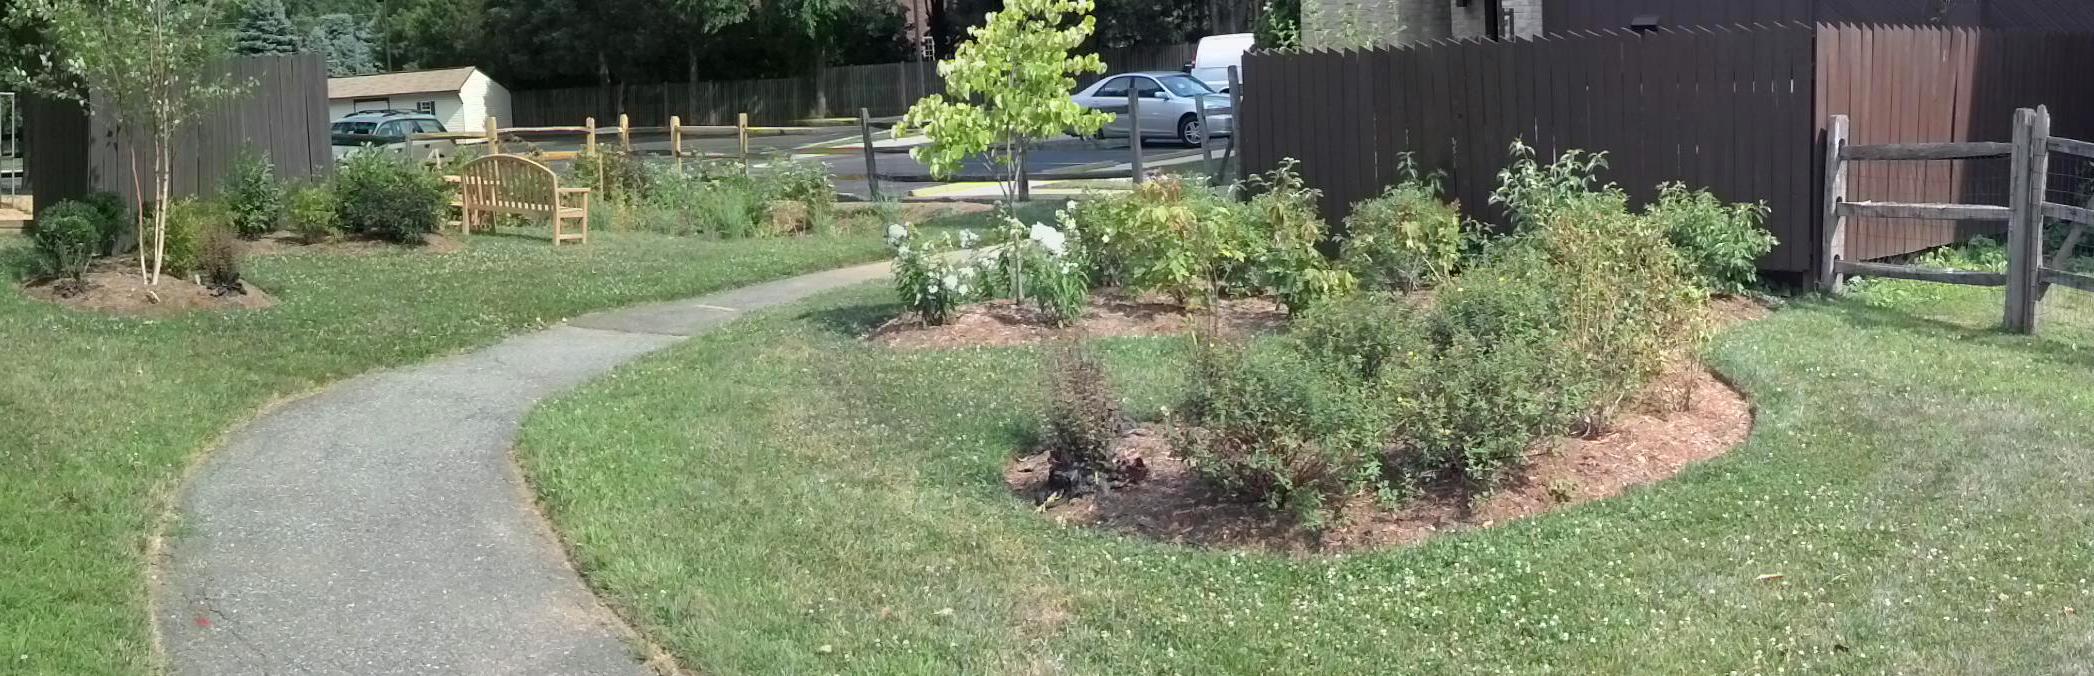 Image of St. James rain garden